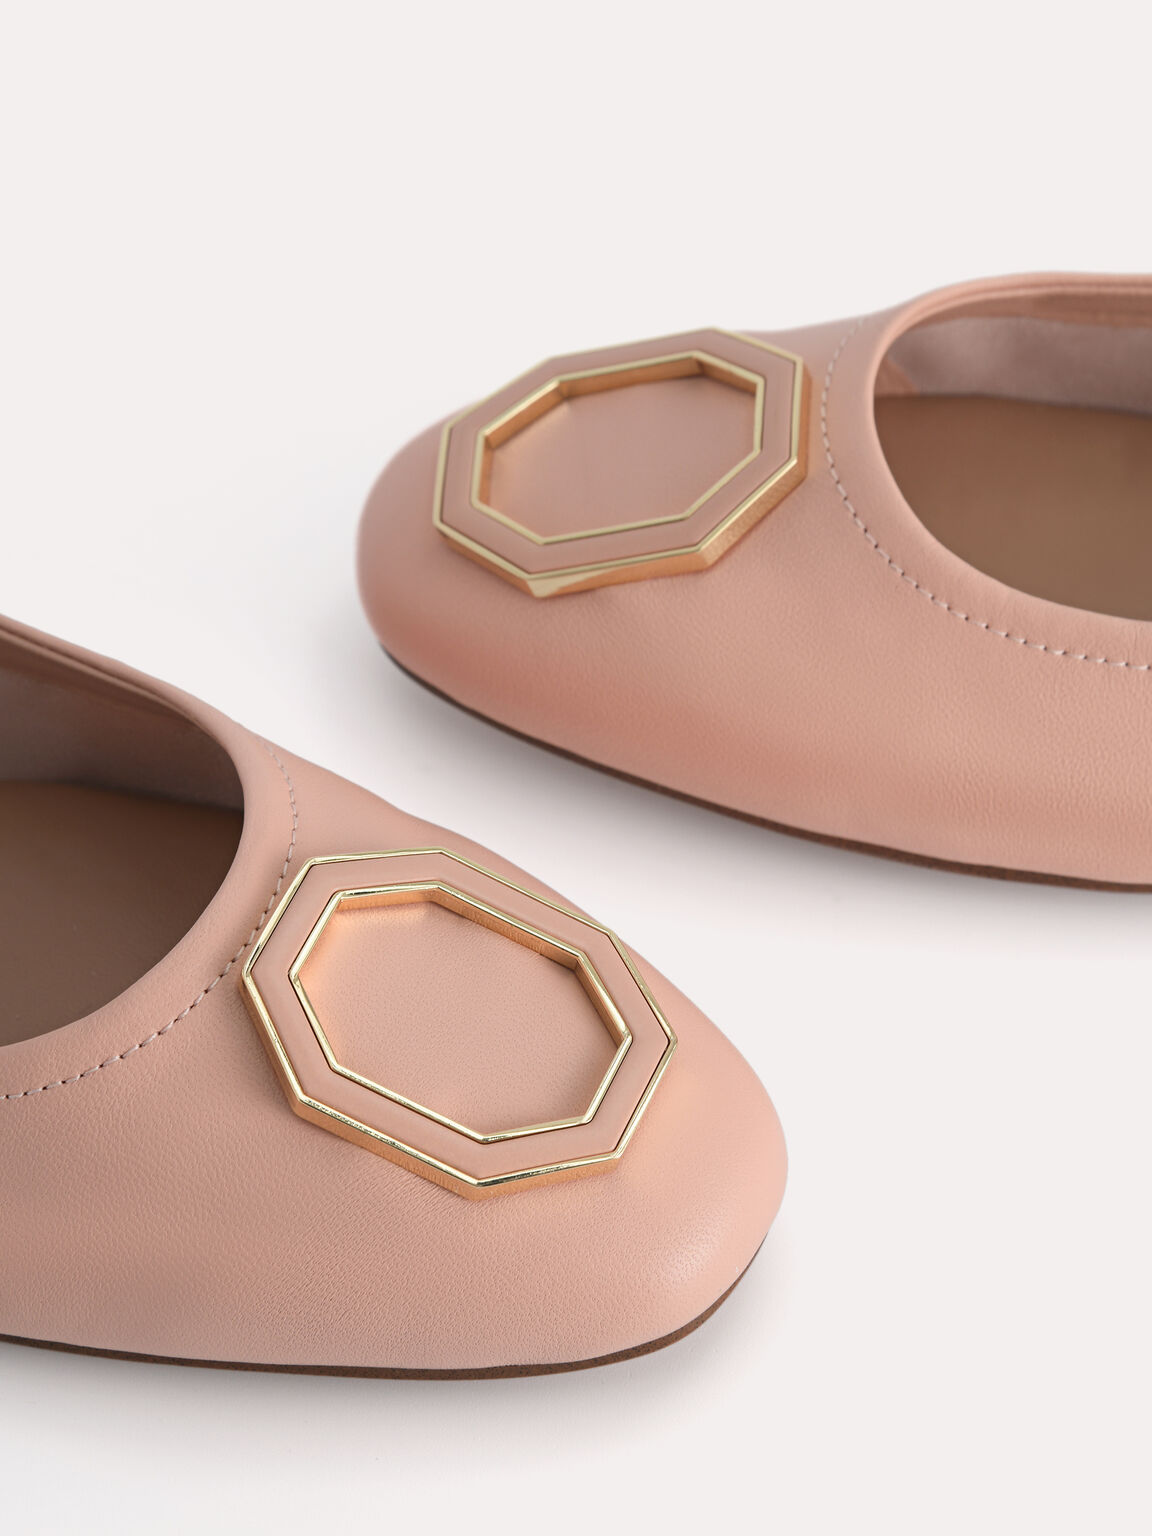 Leather Ballerina Flats, Blush, hi-res